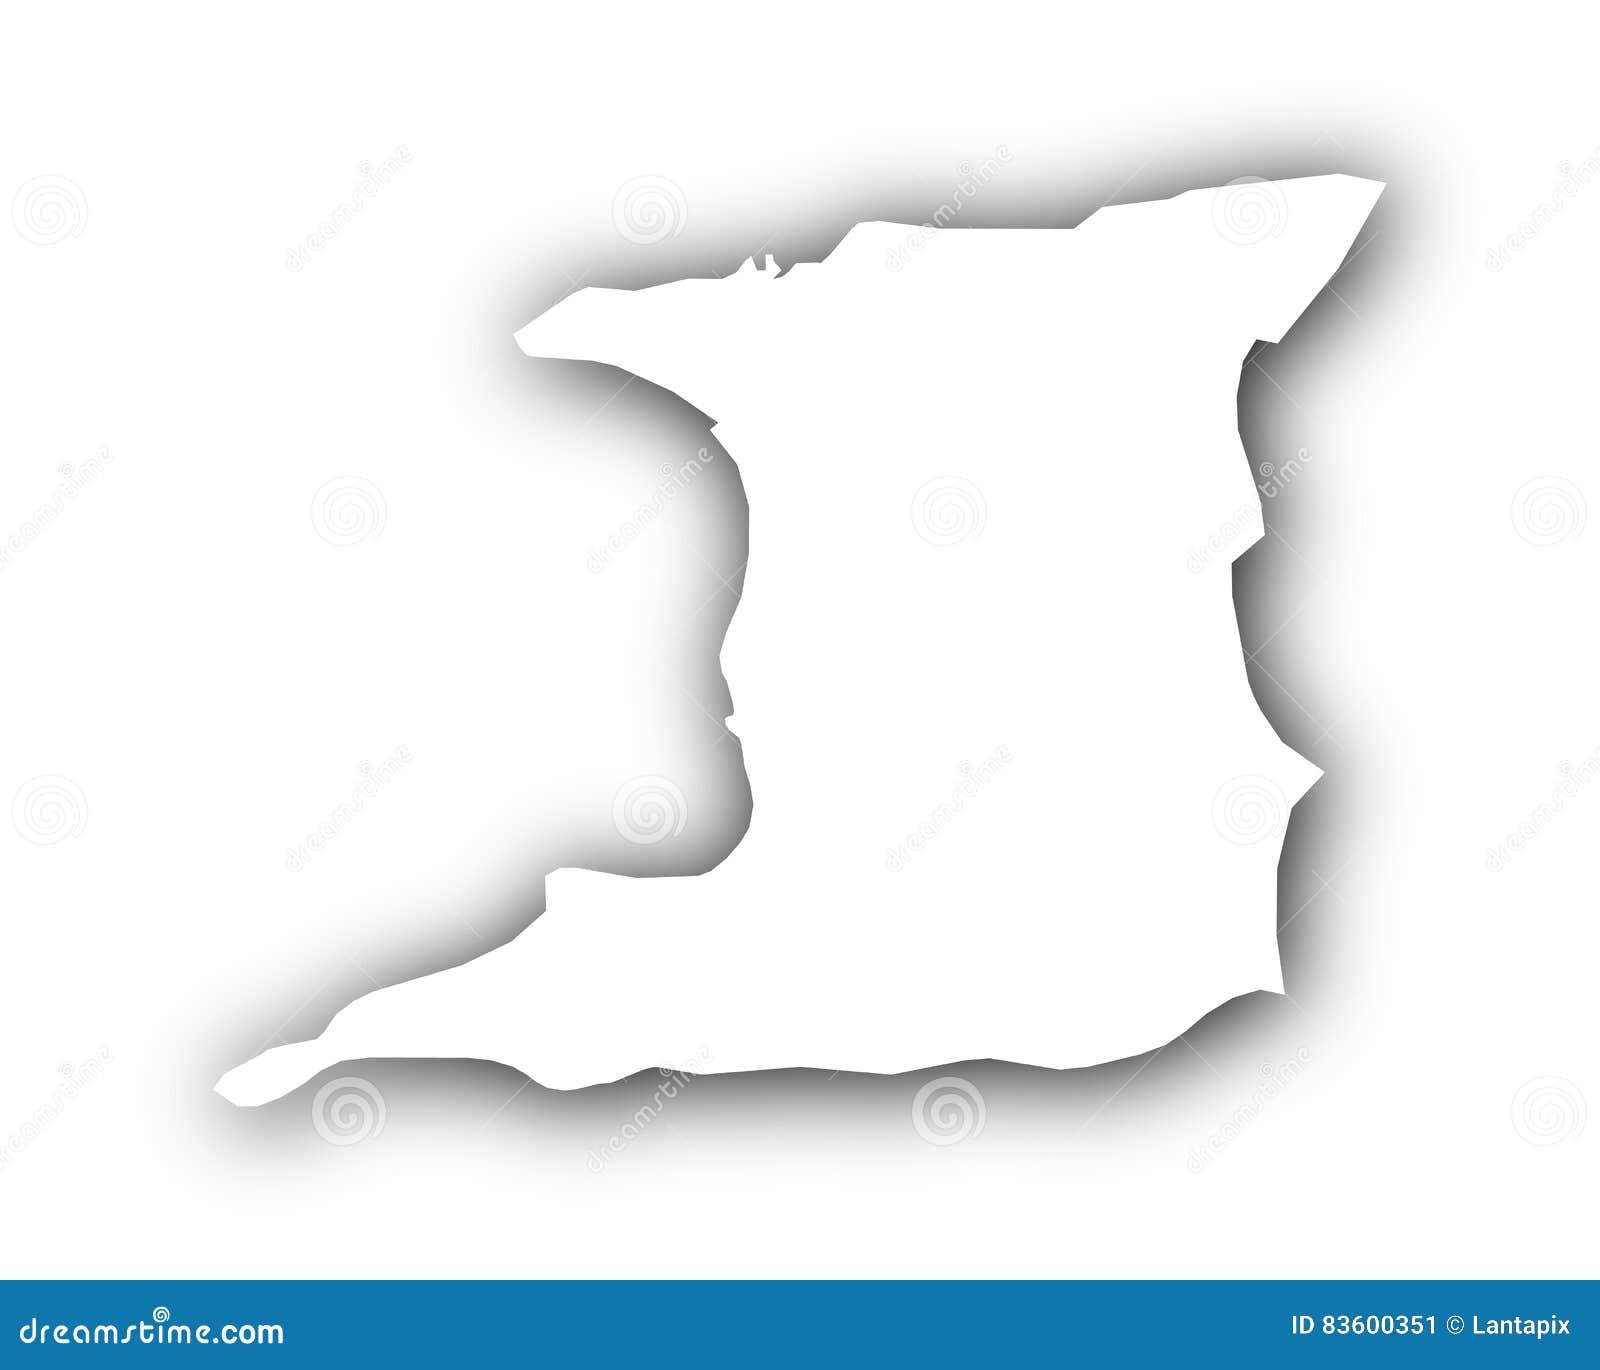 Map Of Trinidad And Tobago With Shadow Stock Vector Illustration - Trinidad map